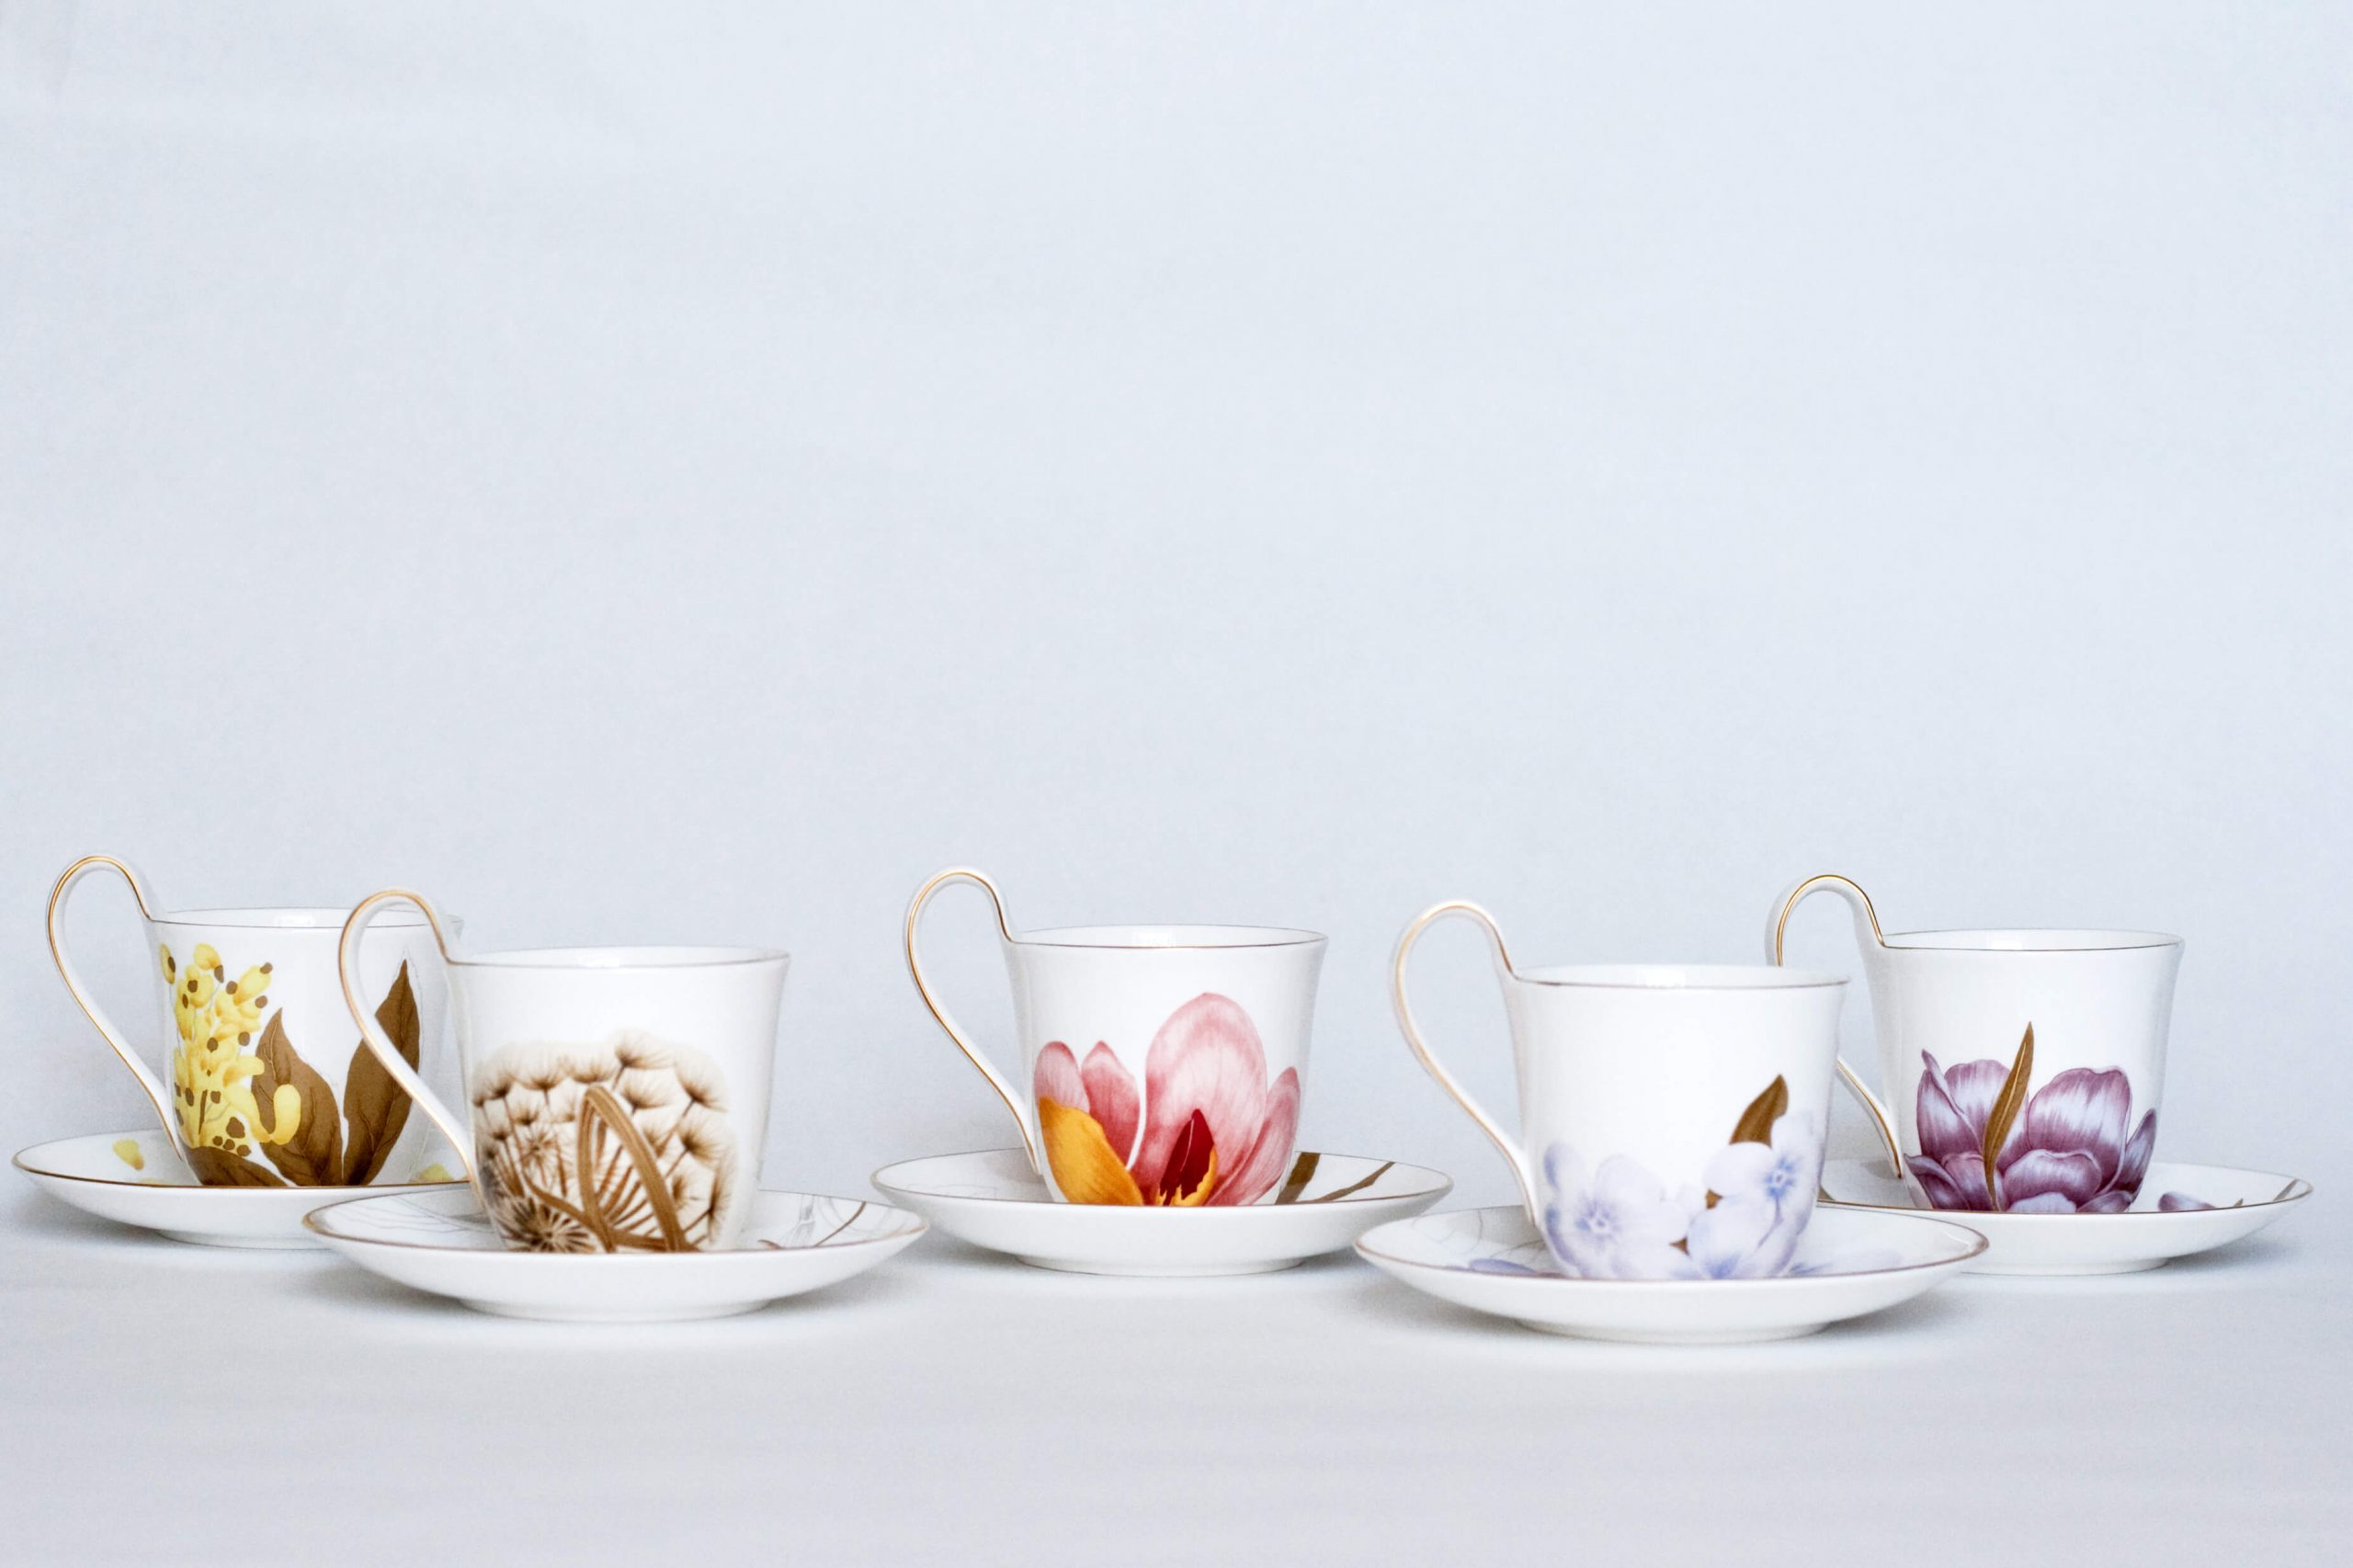 Lej flora royal copenhagen kaffestel_a table story eksklusiv serviceudlejning7